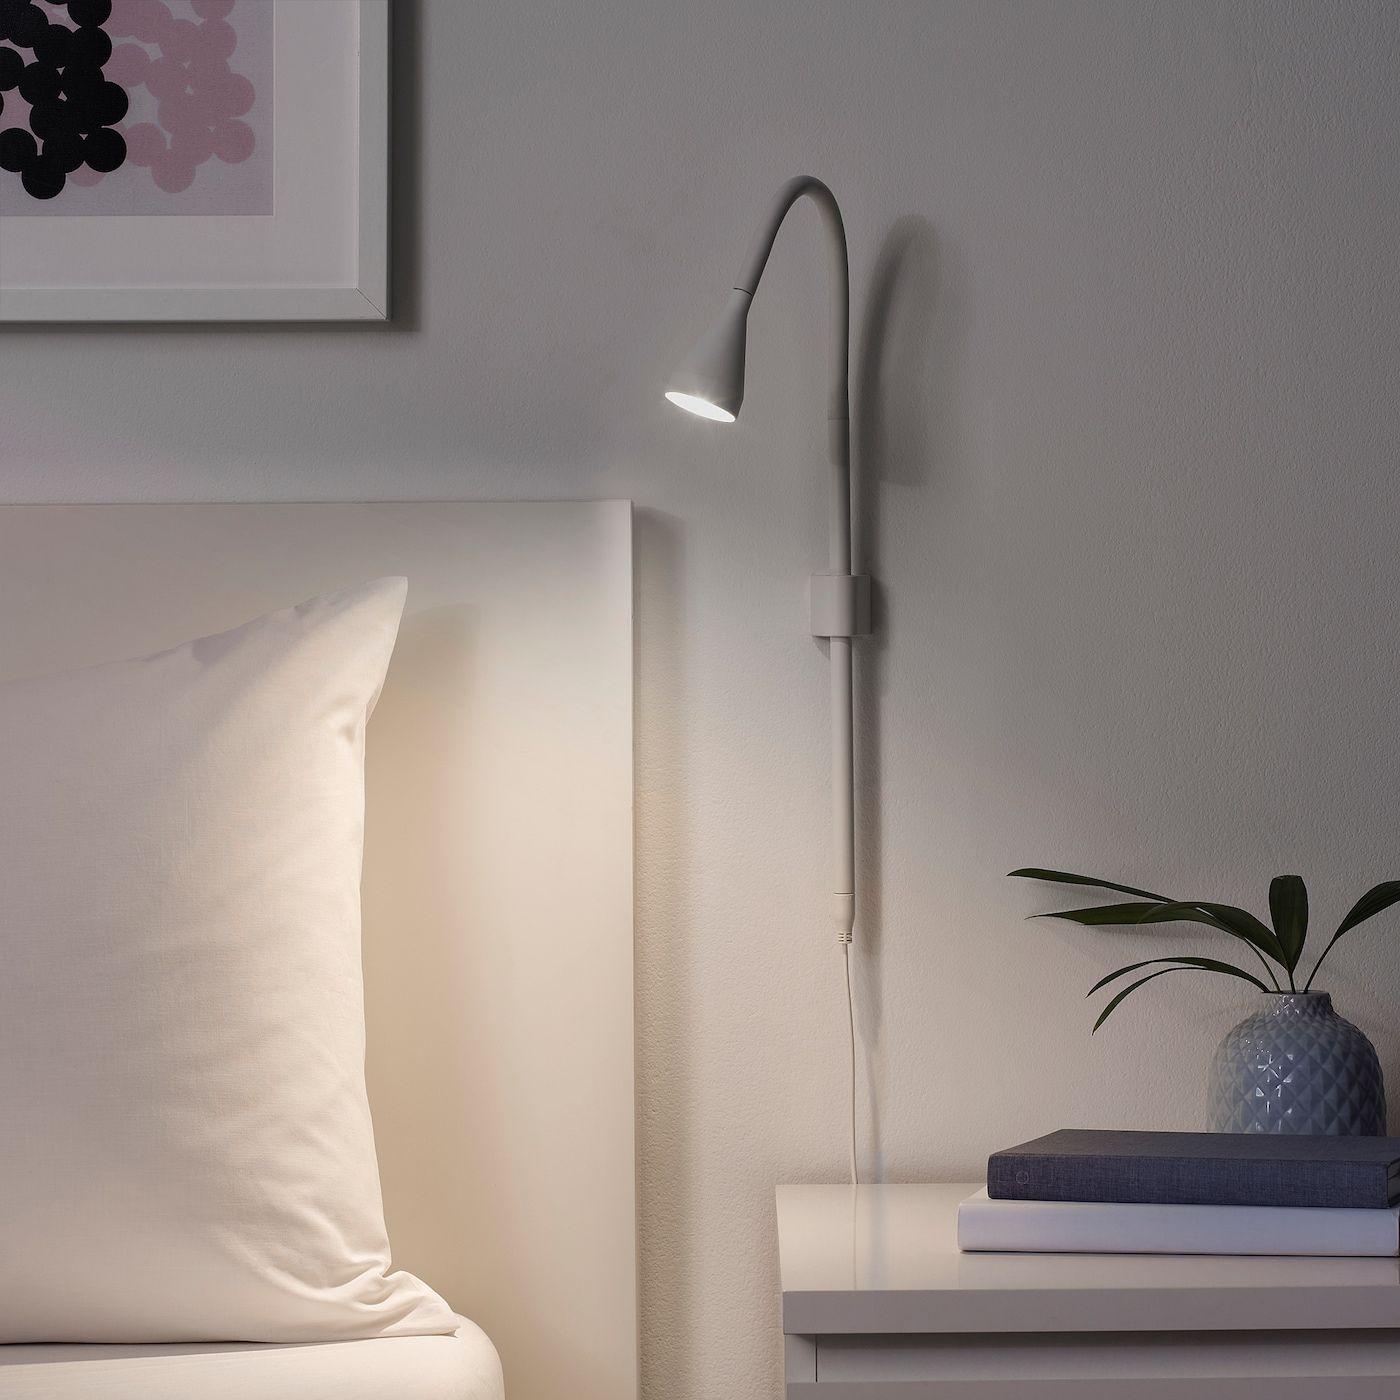 IKEA NÄVLINGE LED wall/clamp spotlight white in 2020